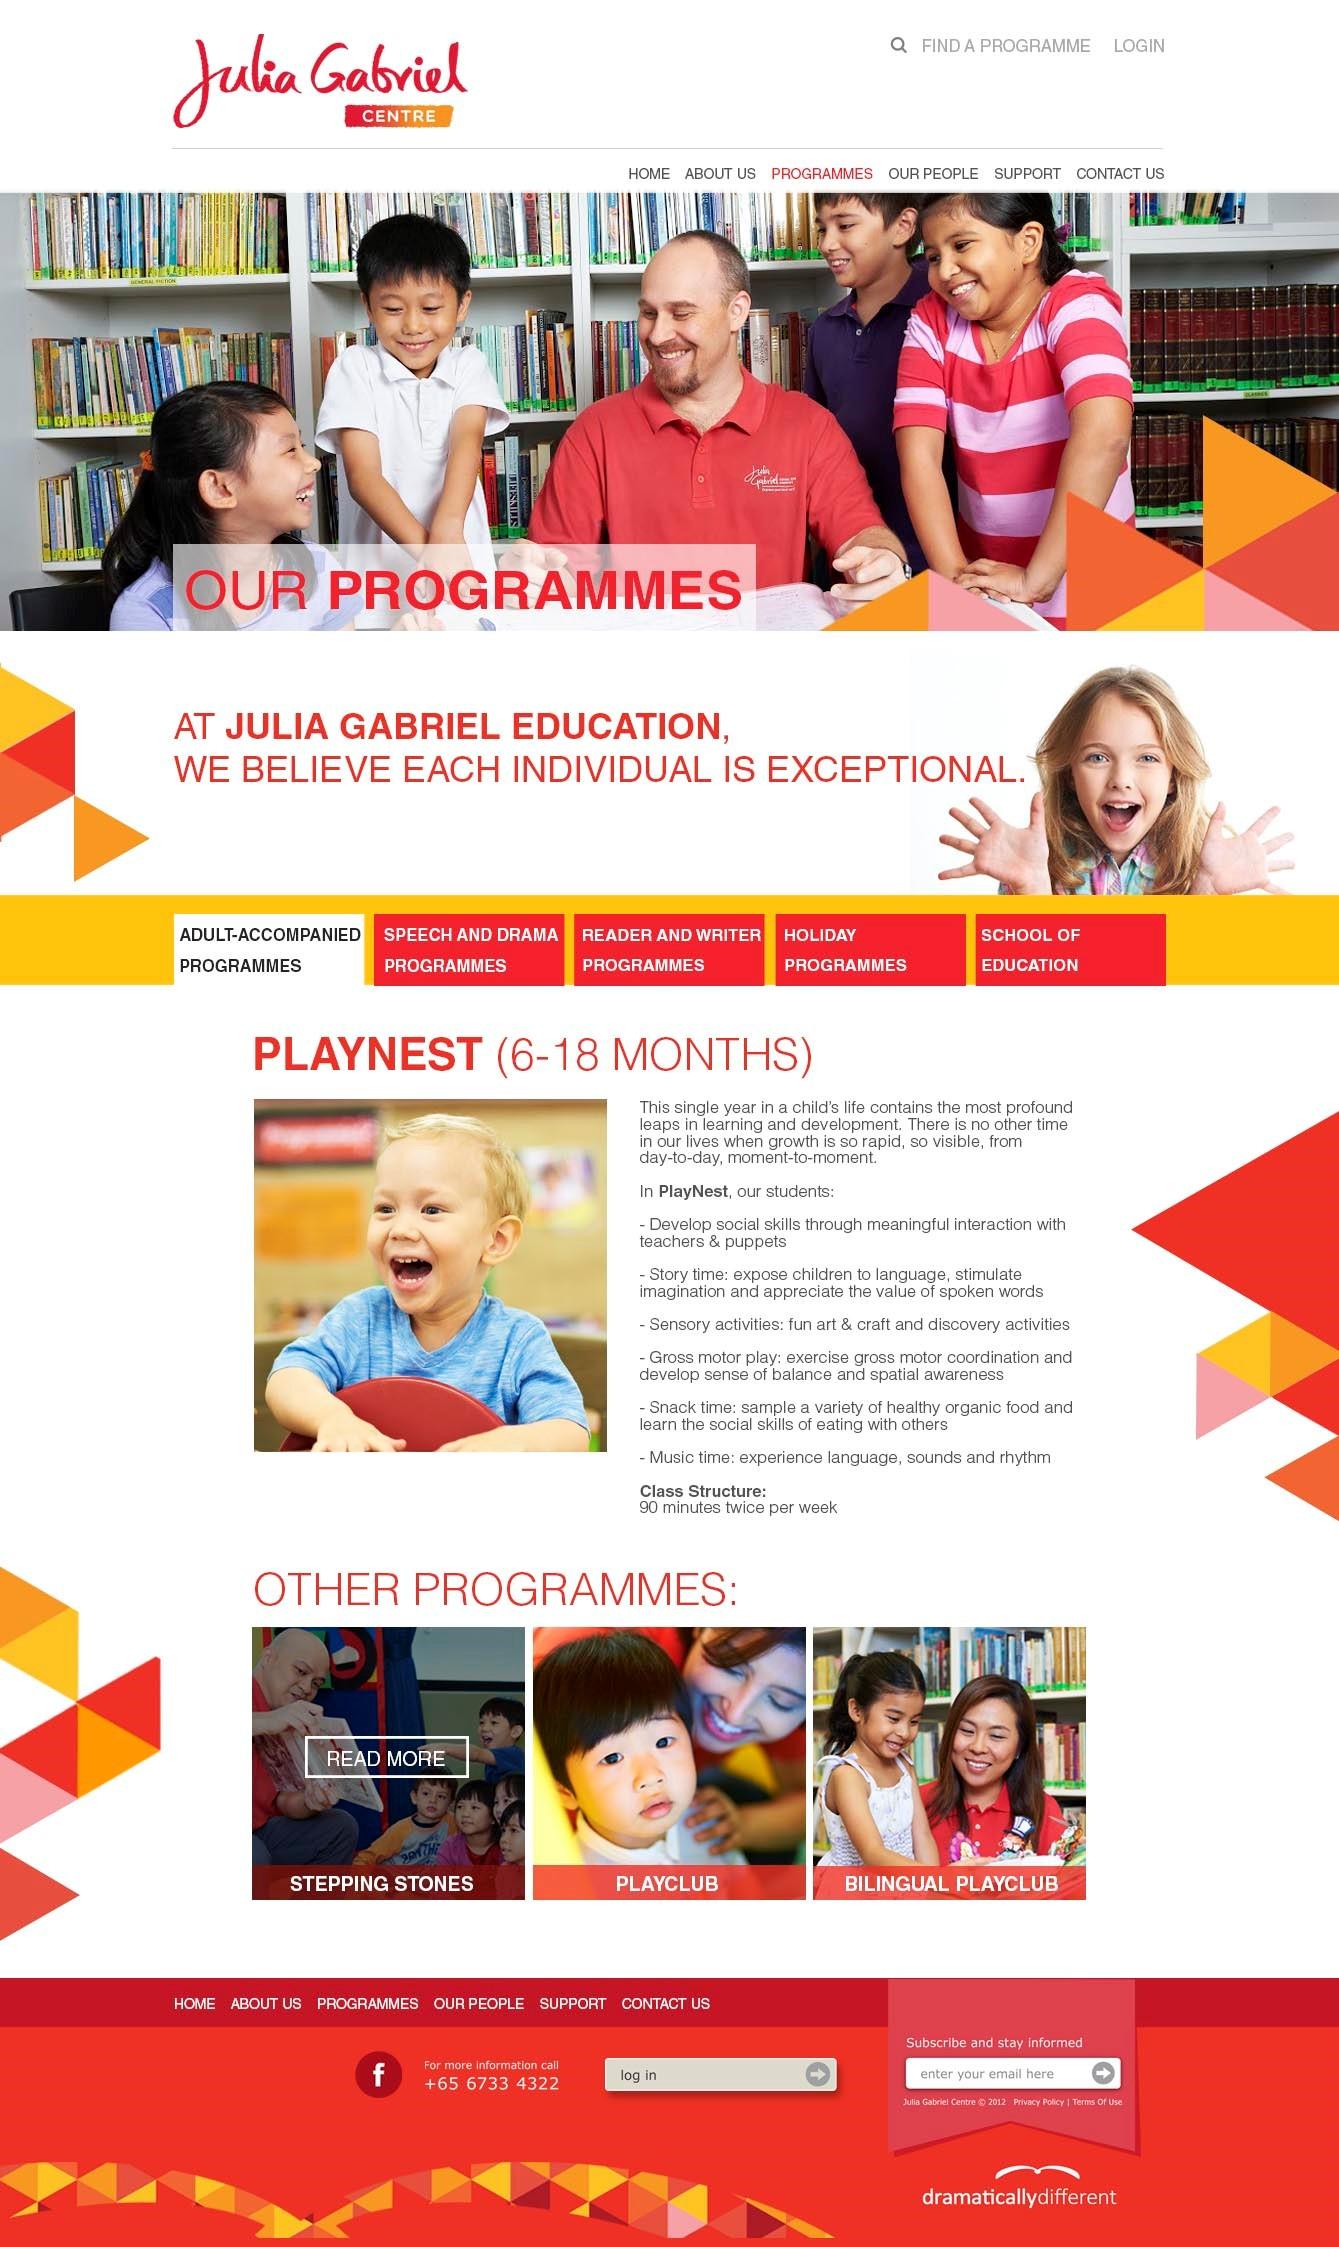 Customized Website Design & Development for Education